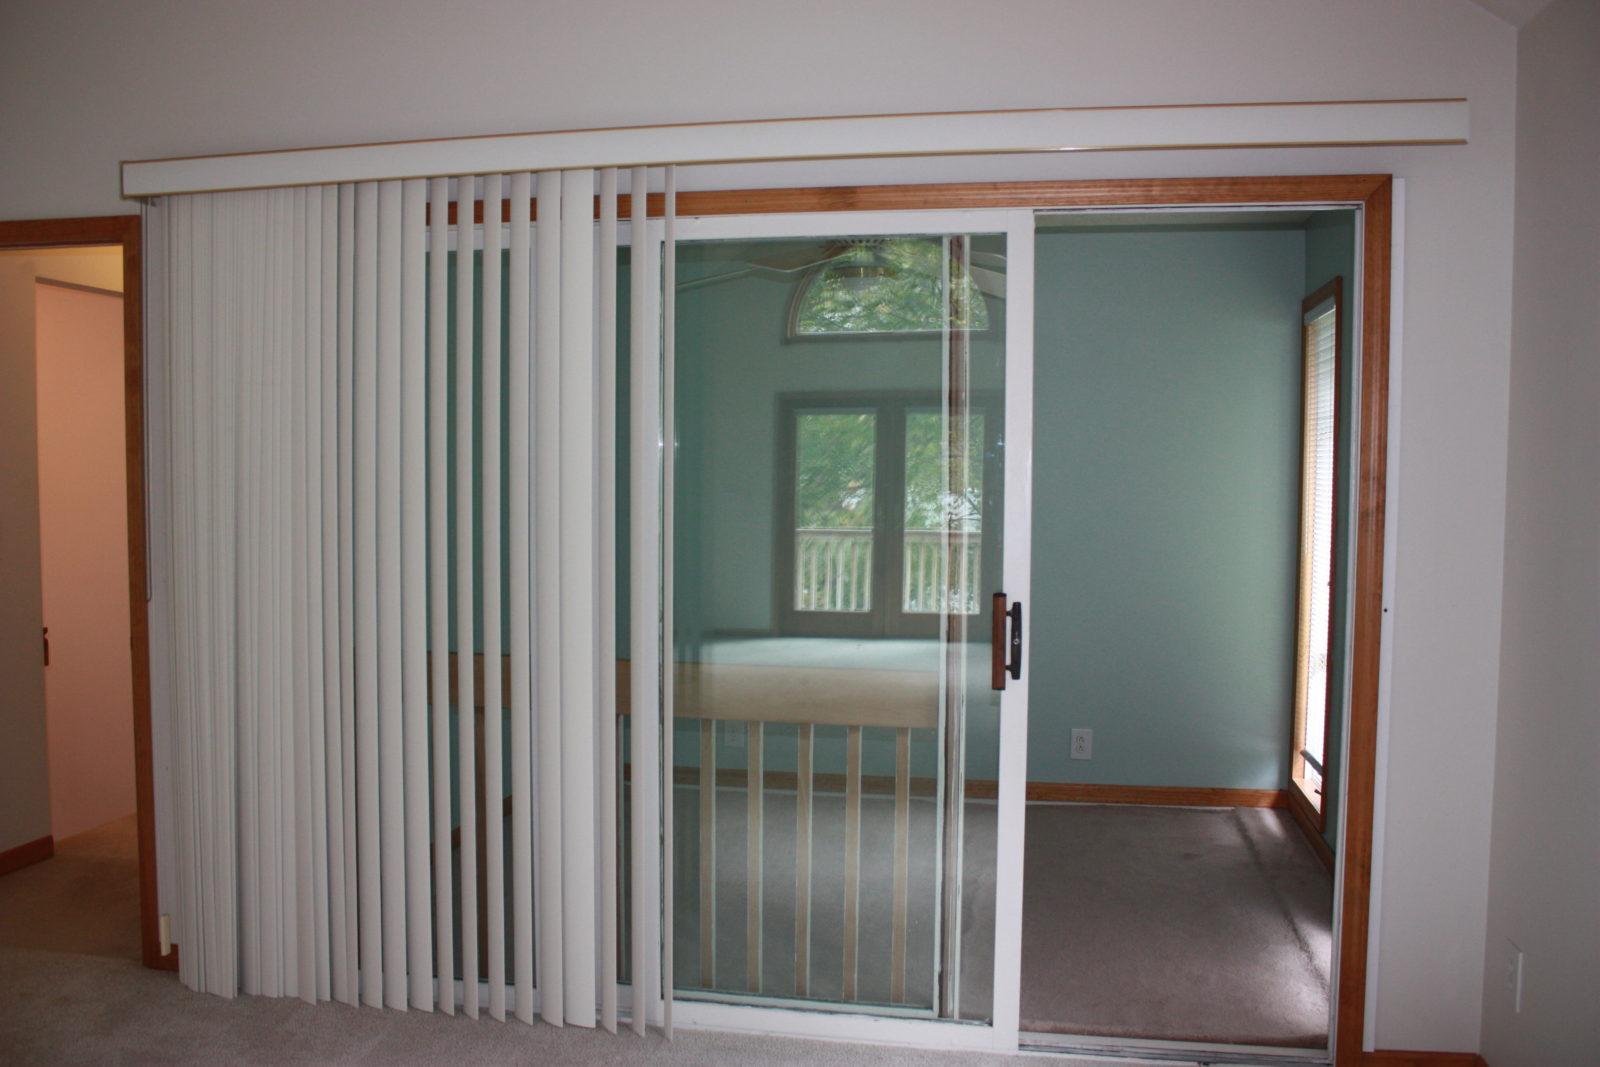 Fonda Lake Master Suite Office Remodeled Before